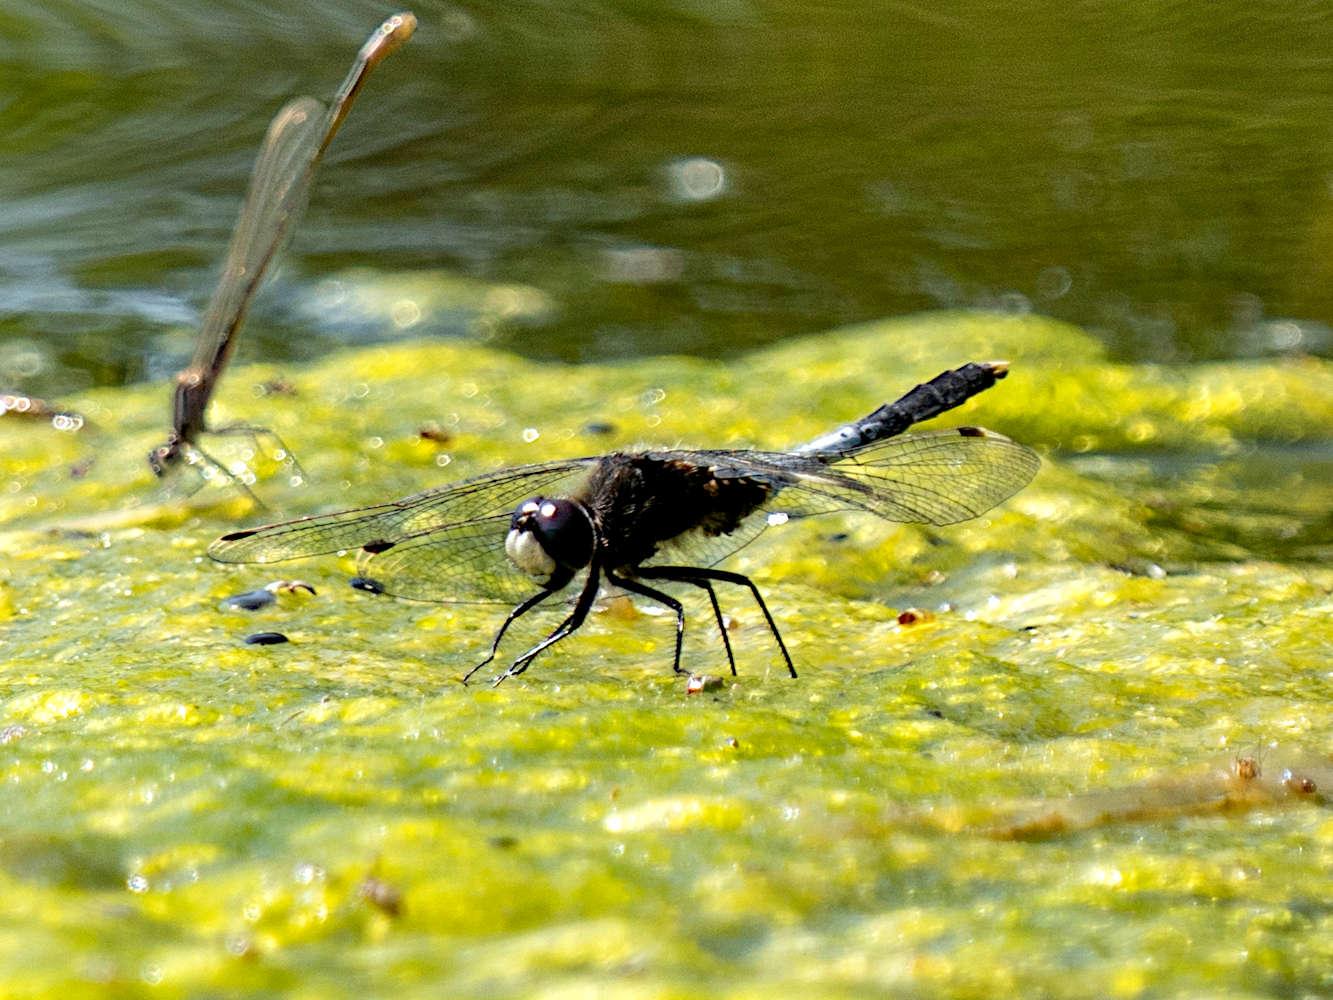 Libellen: Spektakuläre Flugkünstler über dem Wasser